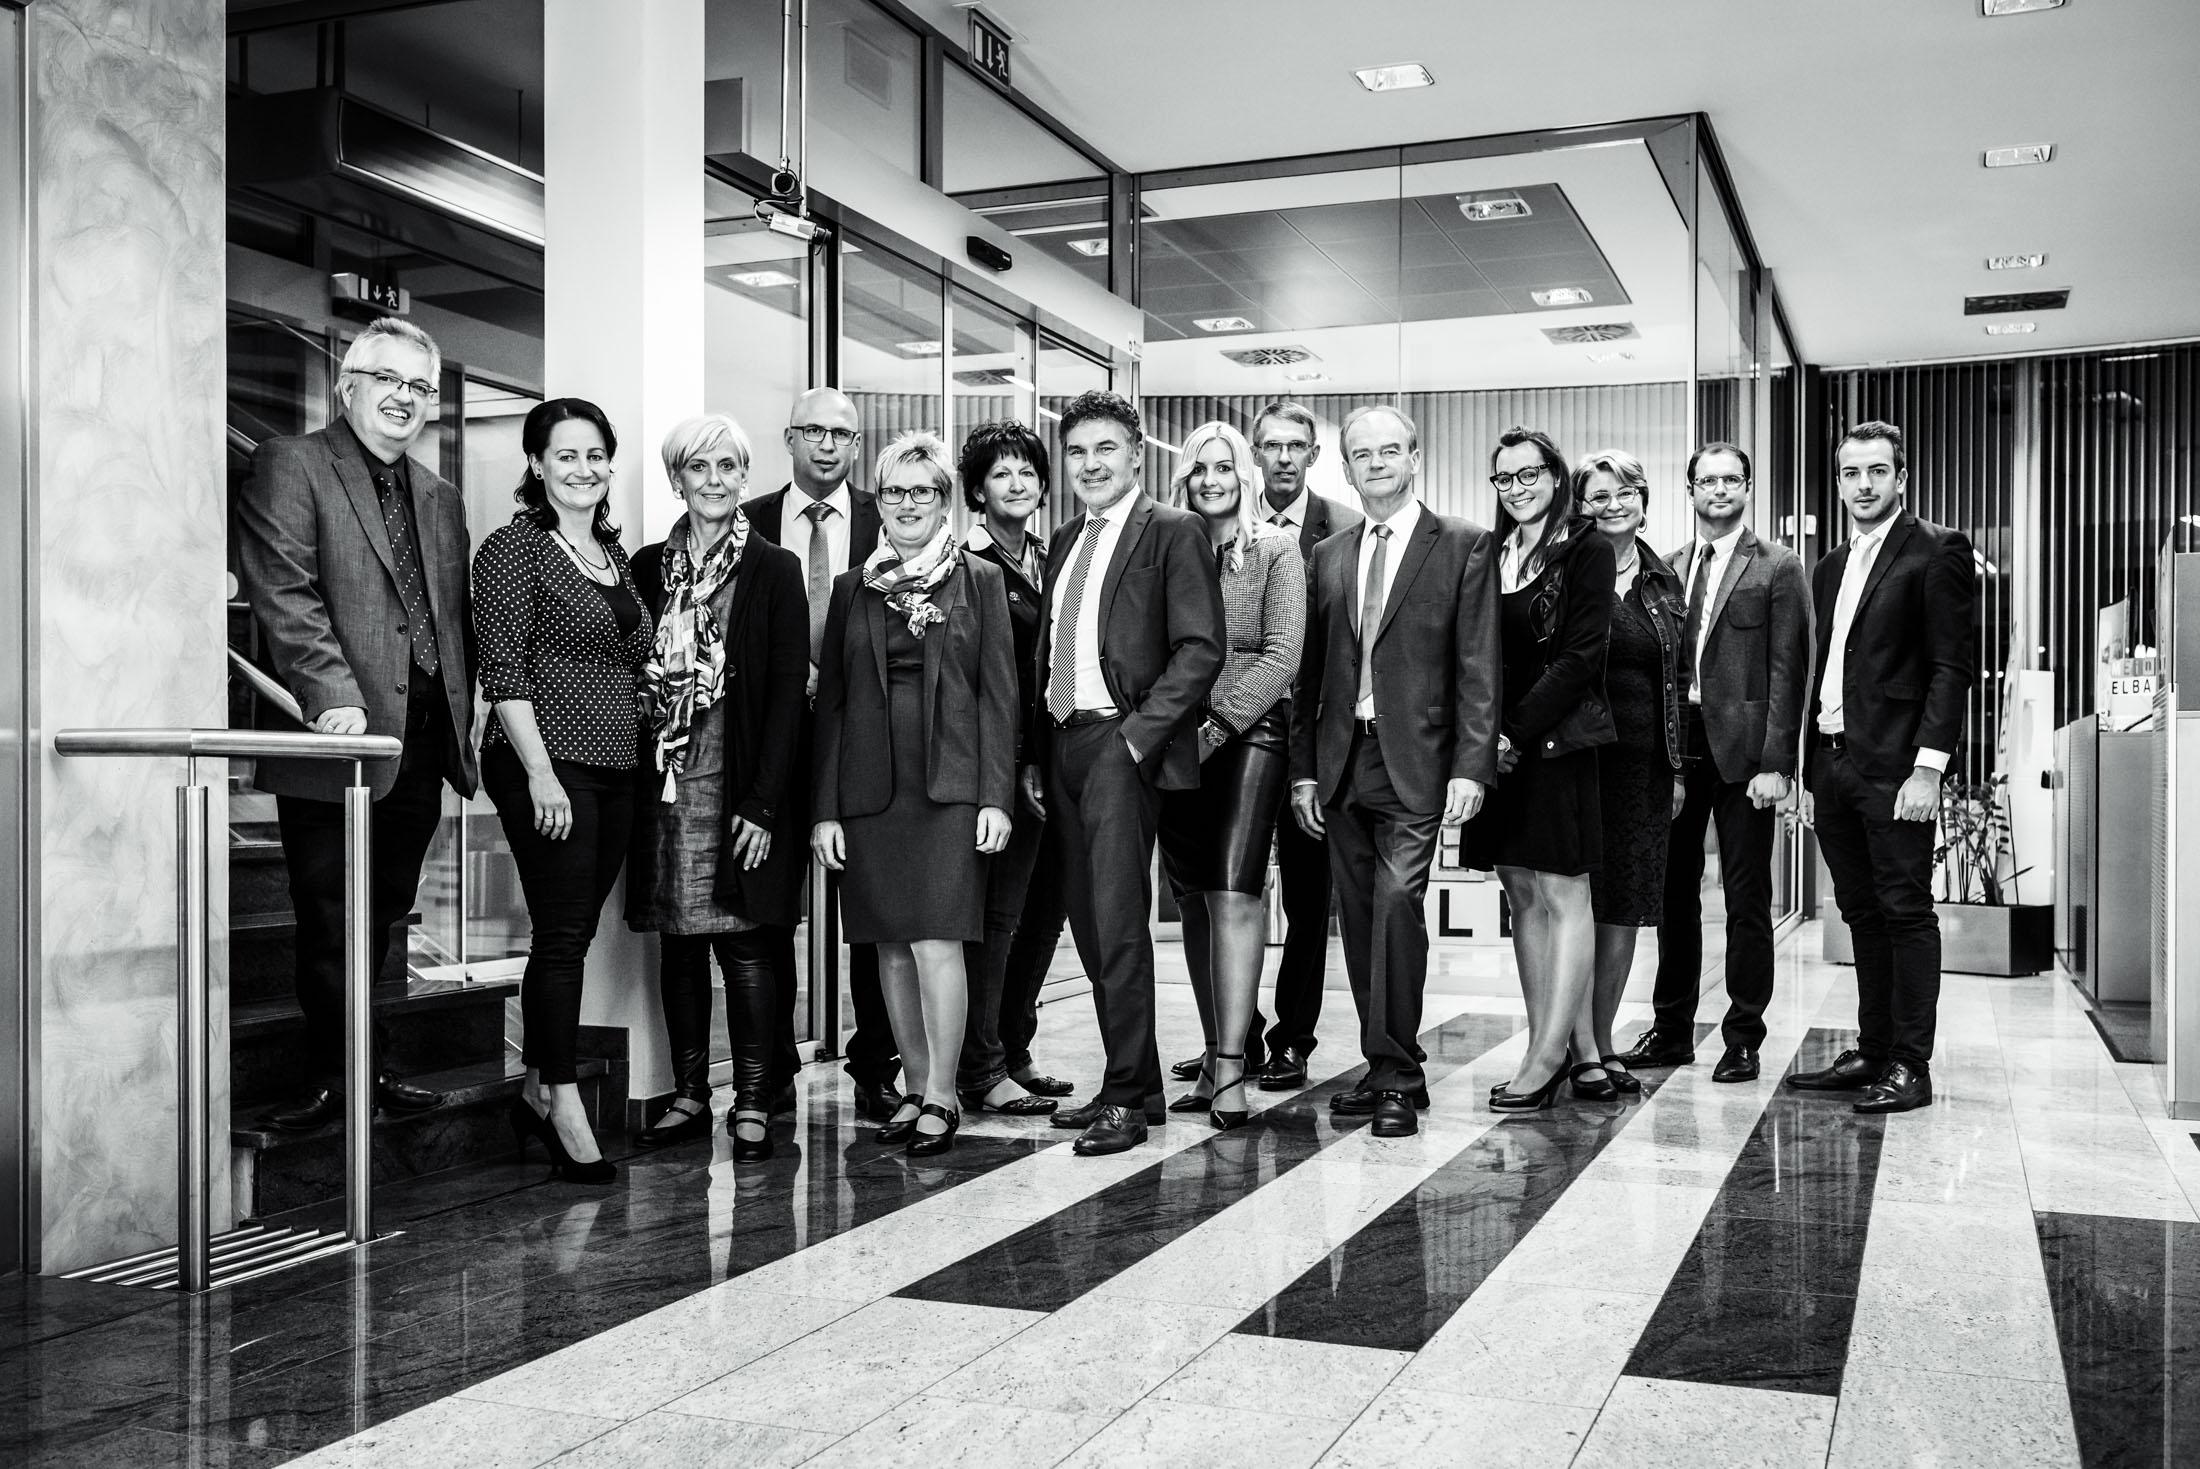 Raiffeisenbank-Businessfoto-Rene-Knabl-Portraitfotograf-Wolfsberg-Kärnten (7).jpg